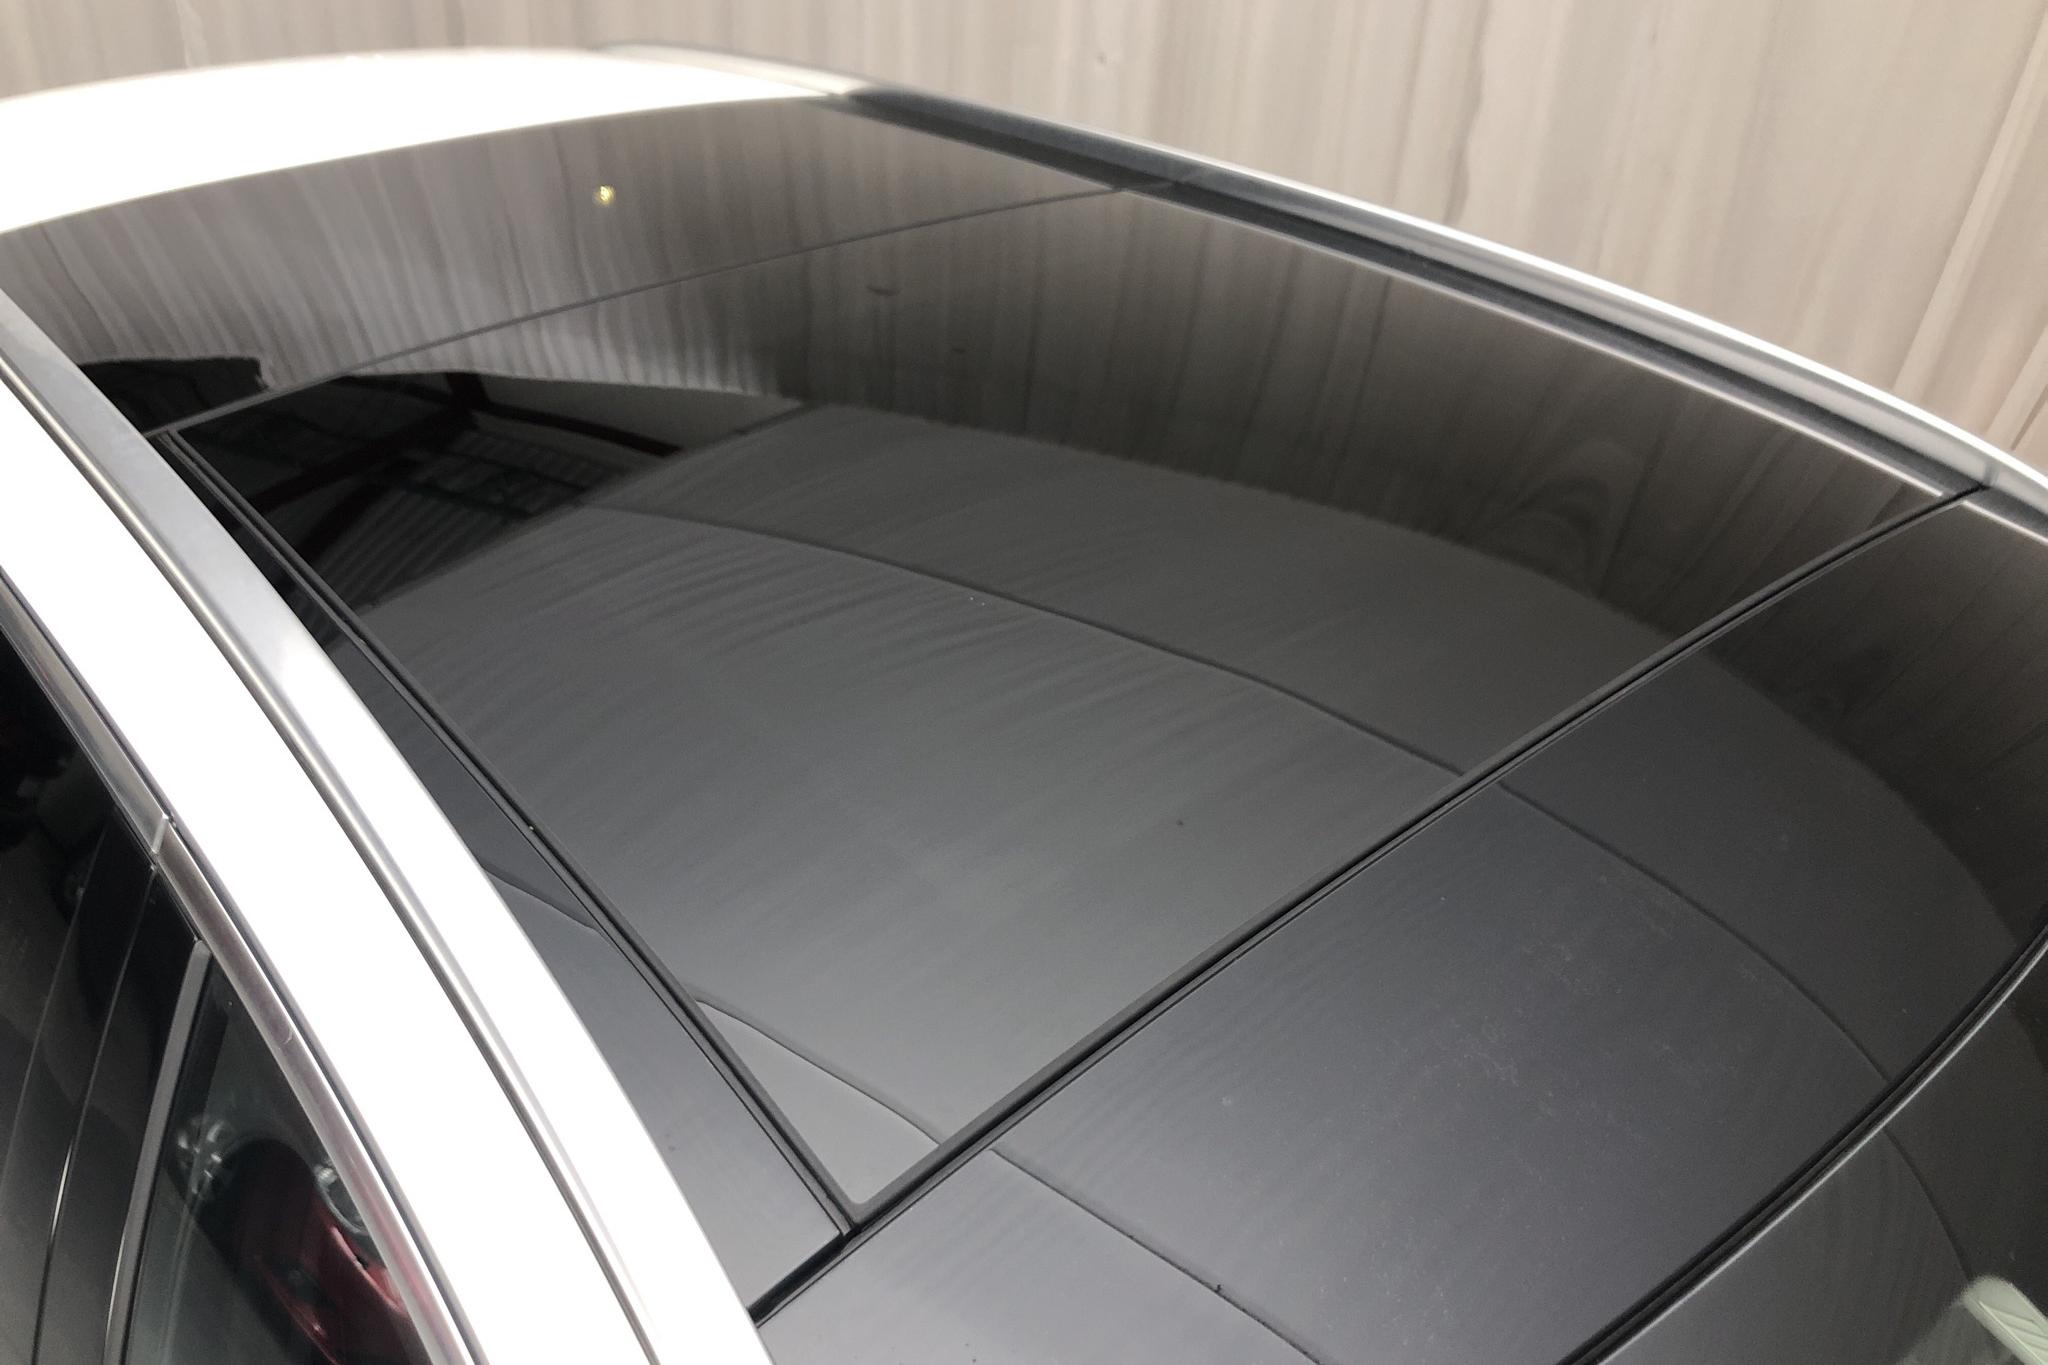 Mercedes C 350 e Kombi S205 (211hk) - 85 850 km - Automatic - white - 2016